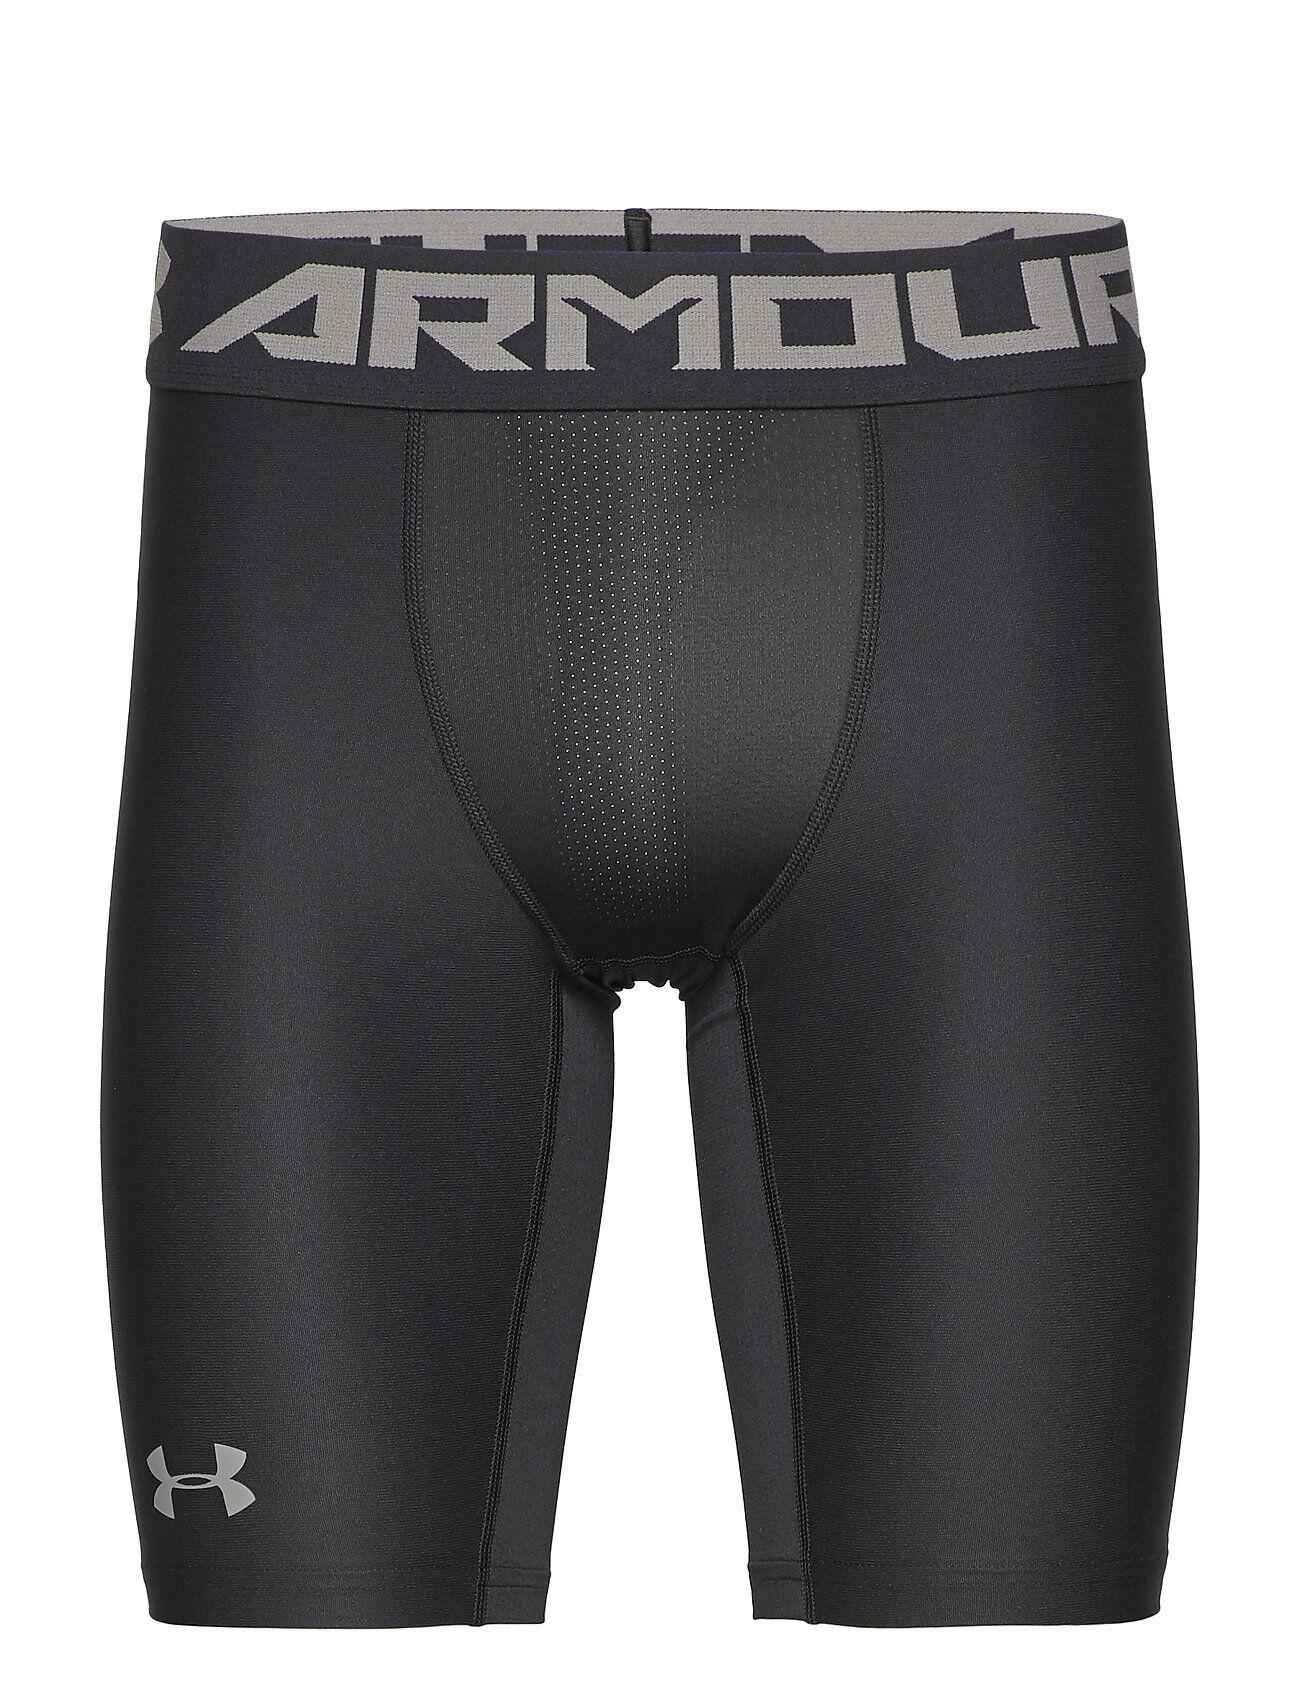 Under Armour Hg Armour 2.0 Long Short Shorts Sport Shorts Musta Under Armour